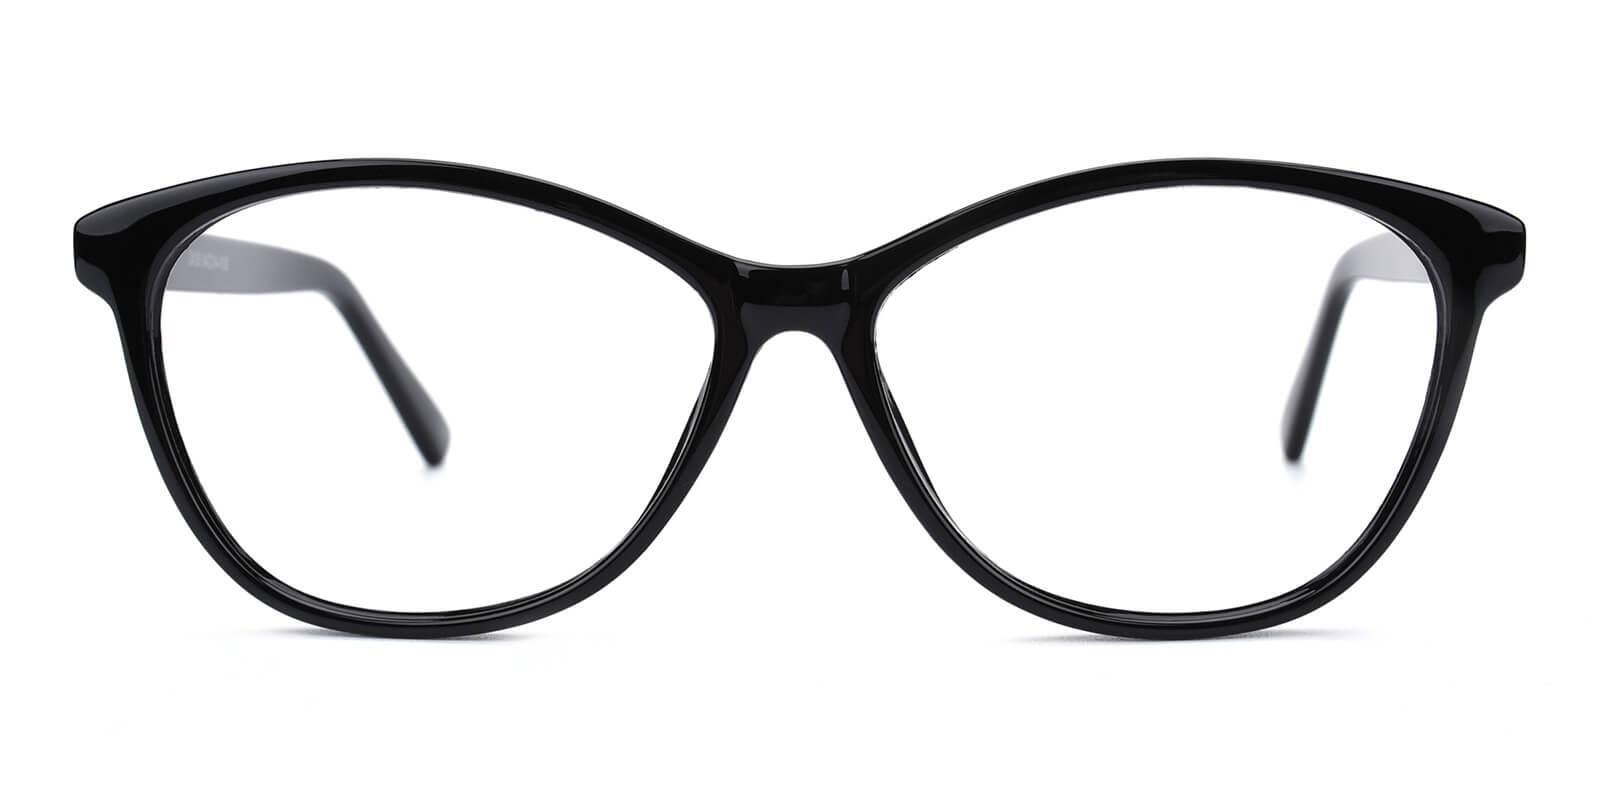 Netfertari-Black-Cat-Plastic-Eyeglasses-additional2